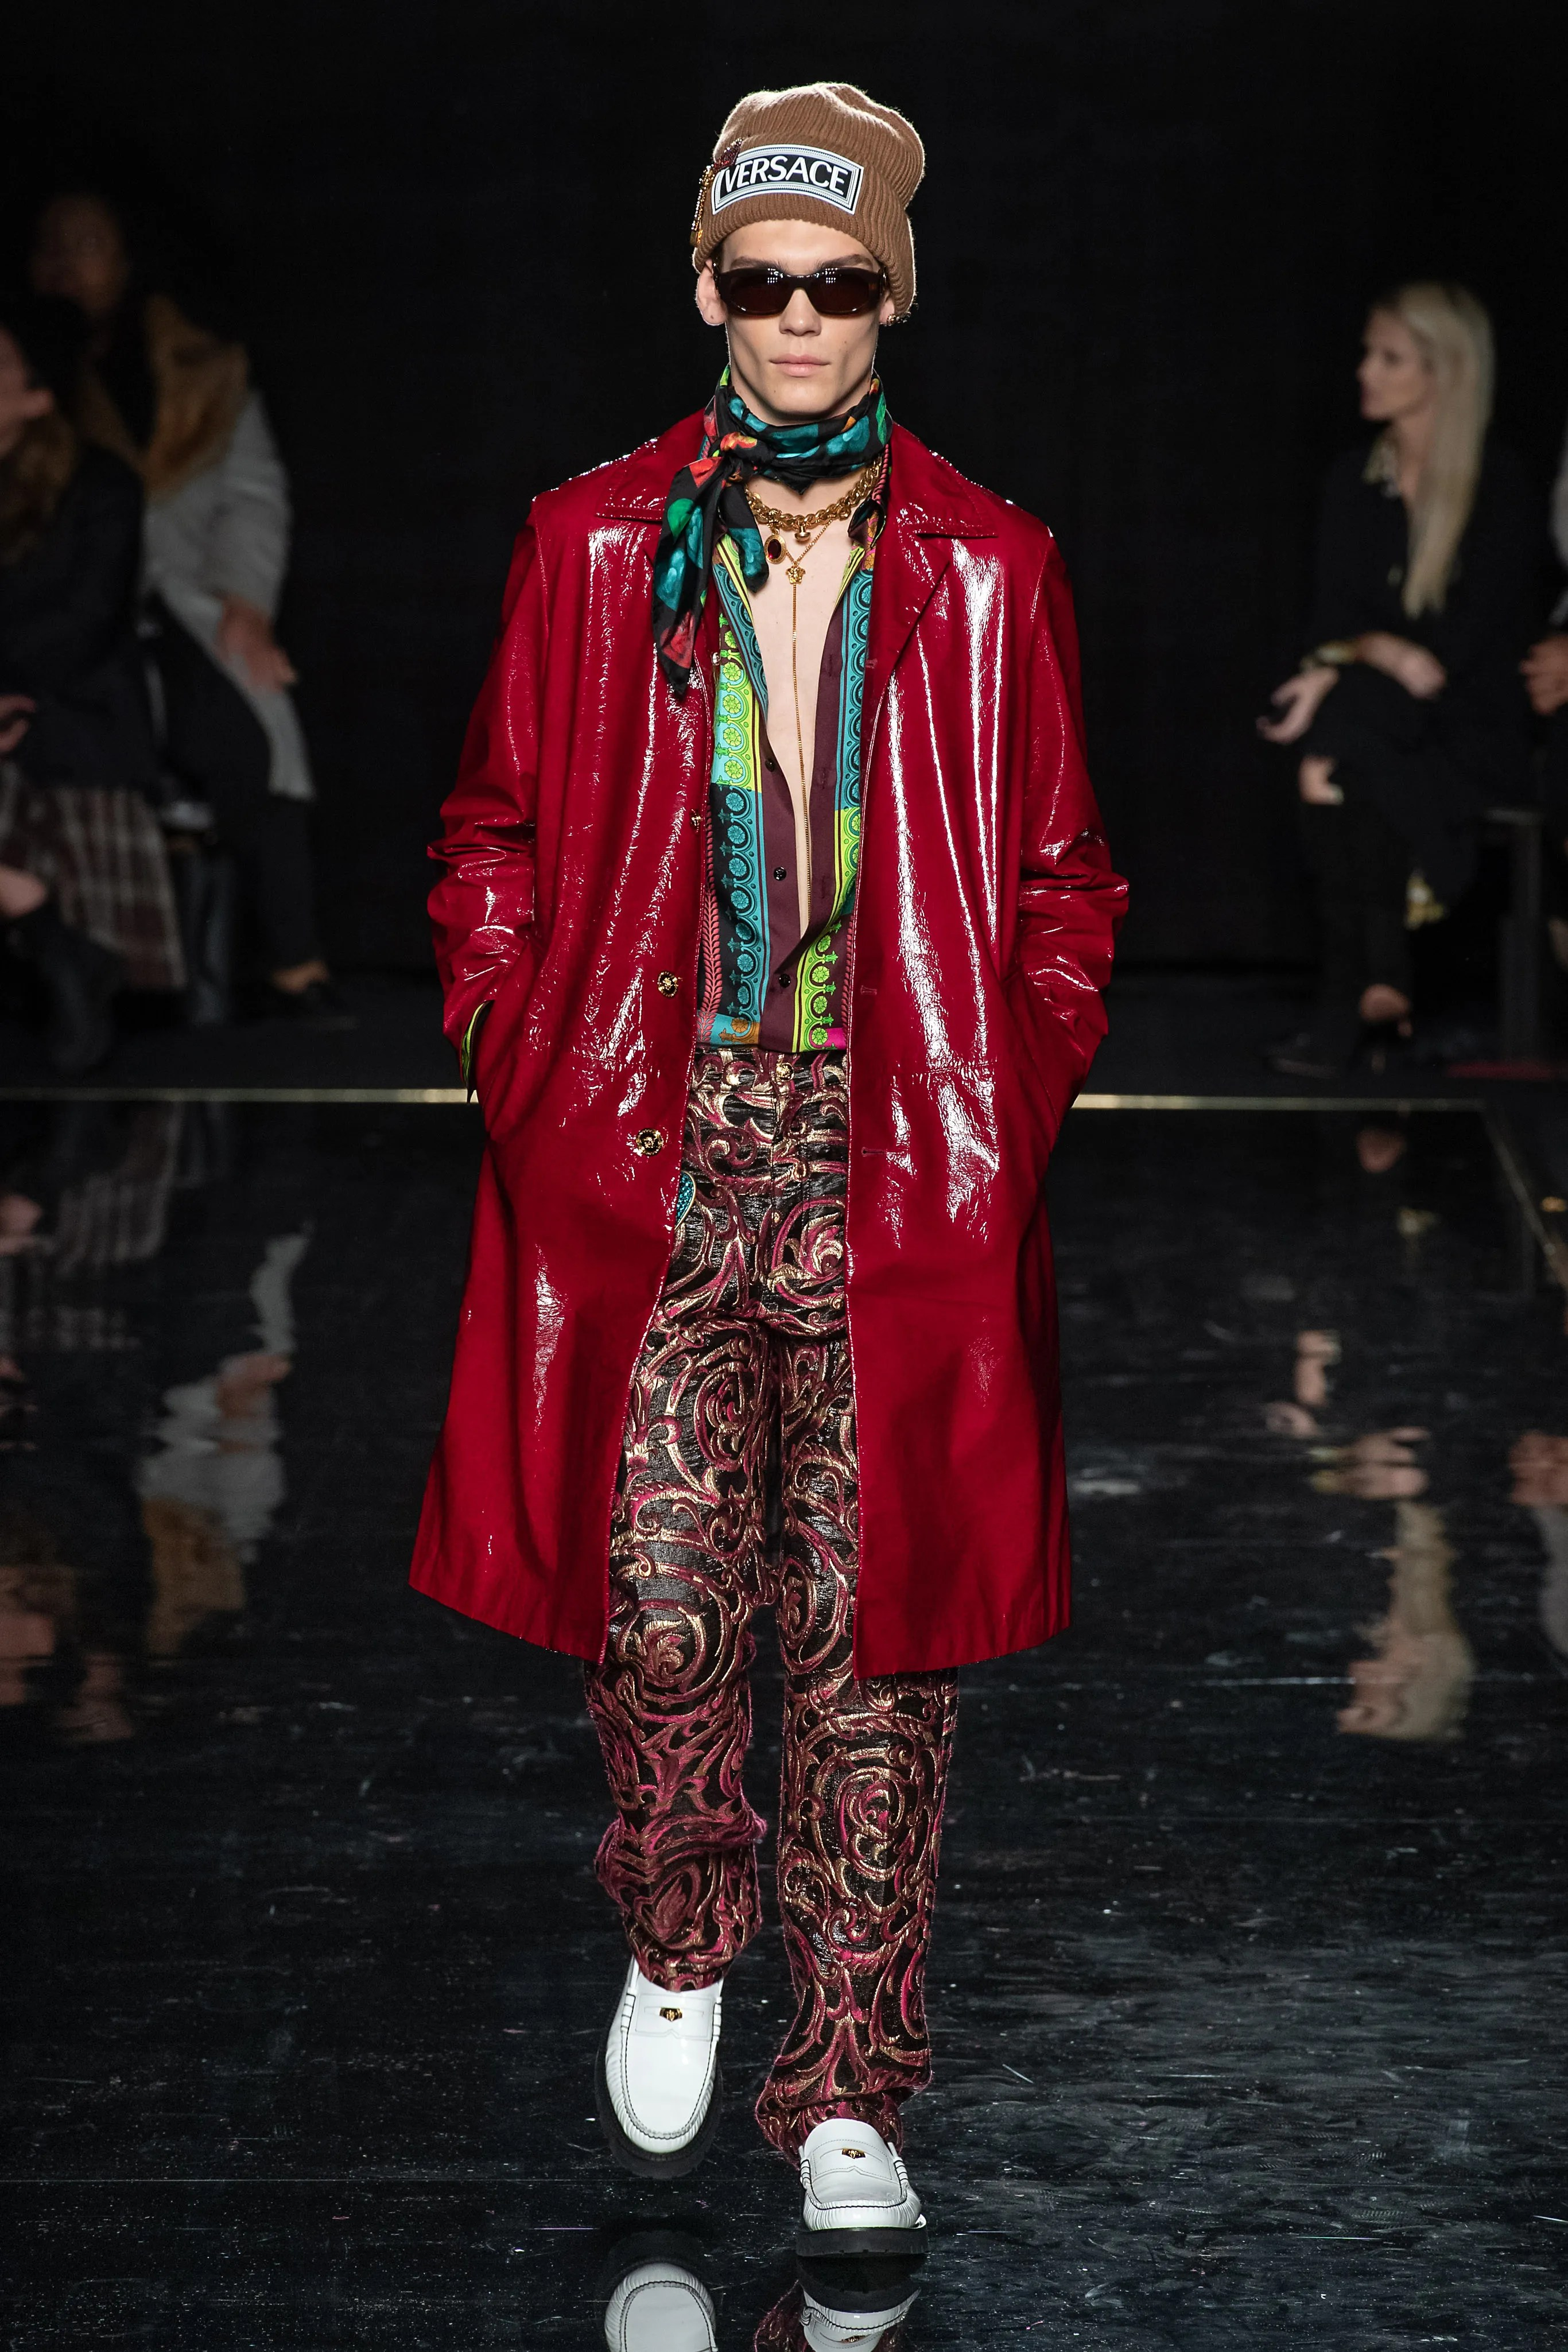 Men's Clothing Selfless Fashion Waitscoat Mens Cowboy Vests Baggy Coat Men Loose Denim Vest Outwear Mens Outer Jacket Casual Coats Tops 2019 Official